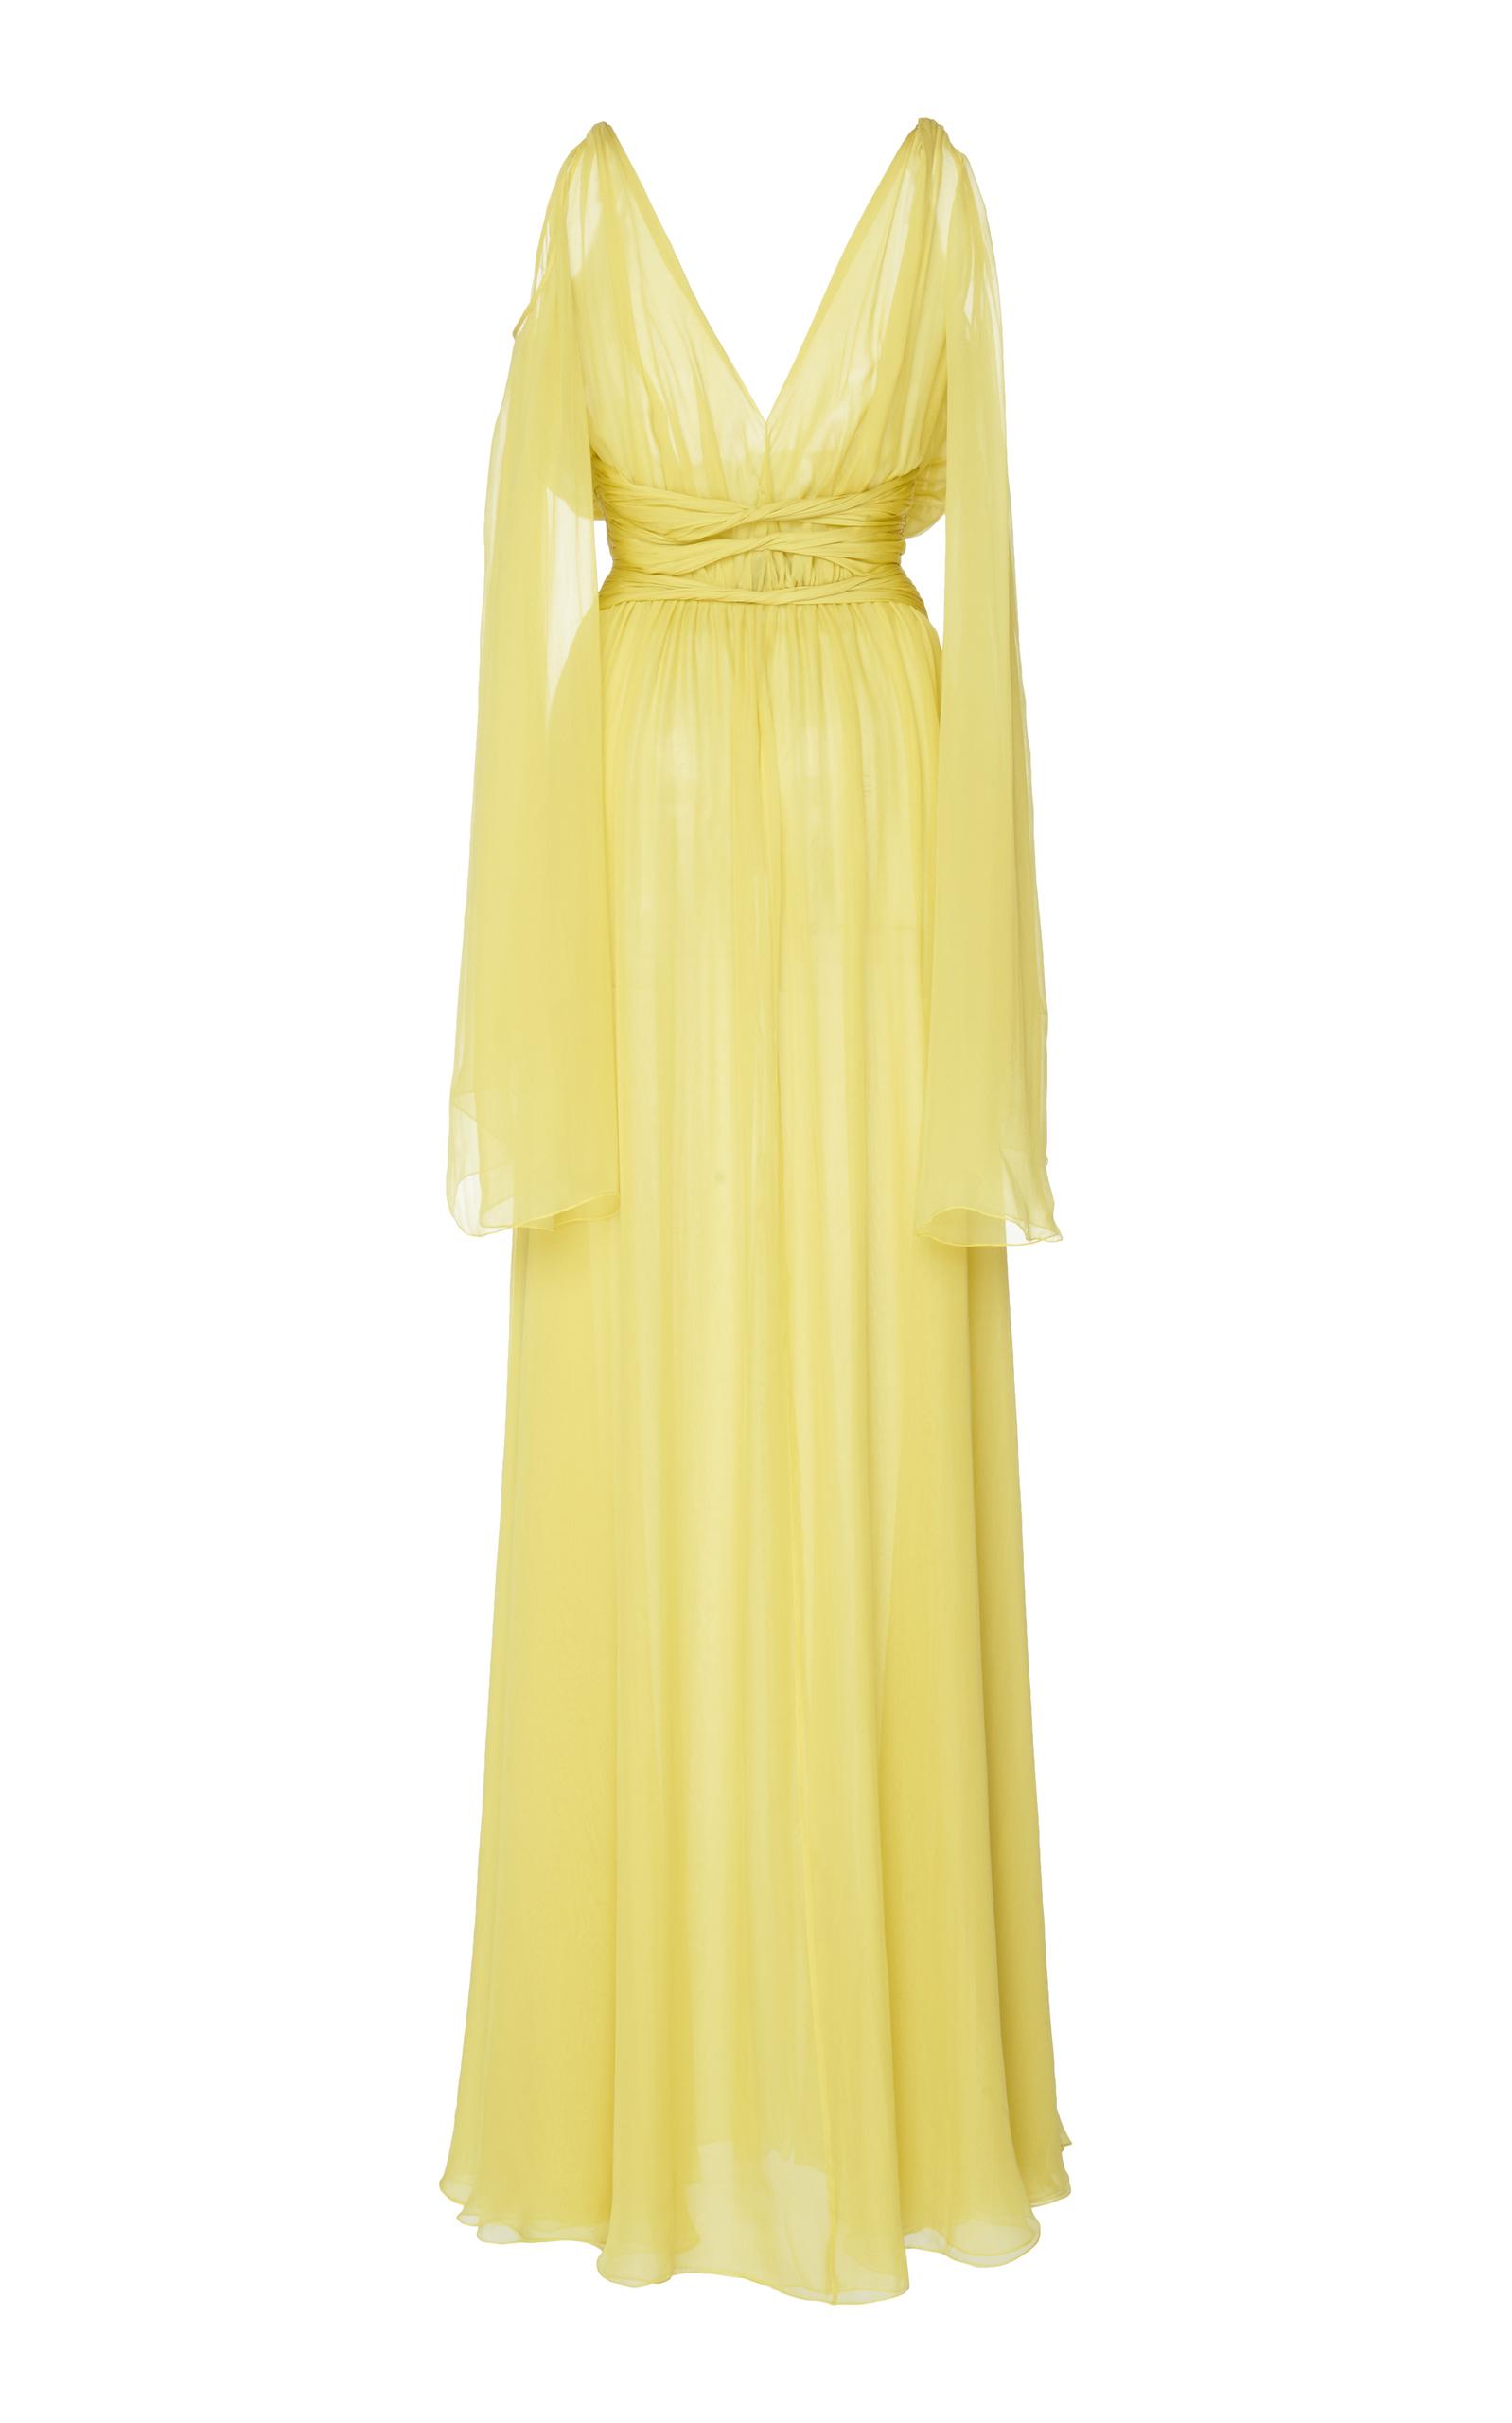 Dundas draped sleeve yellow dress